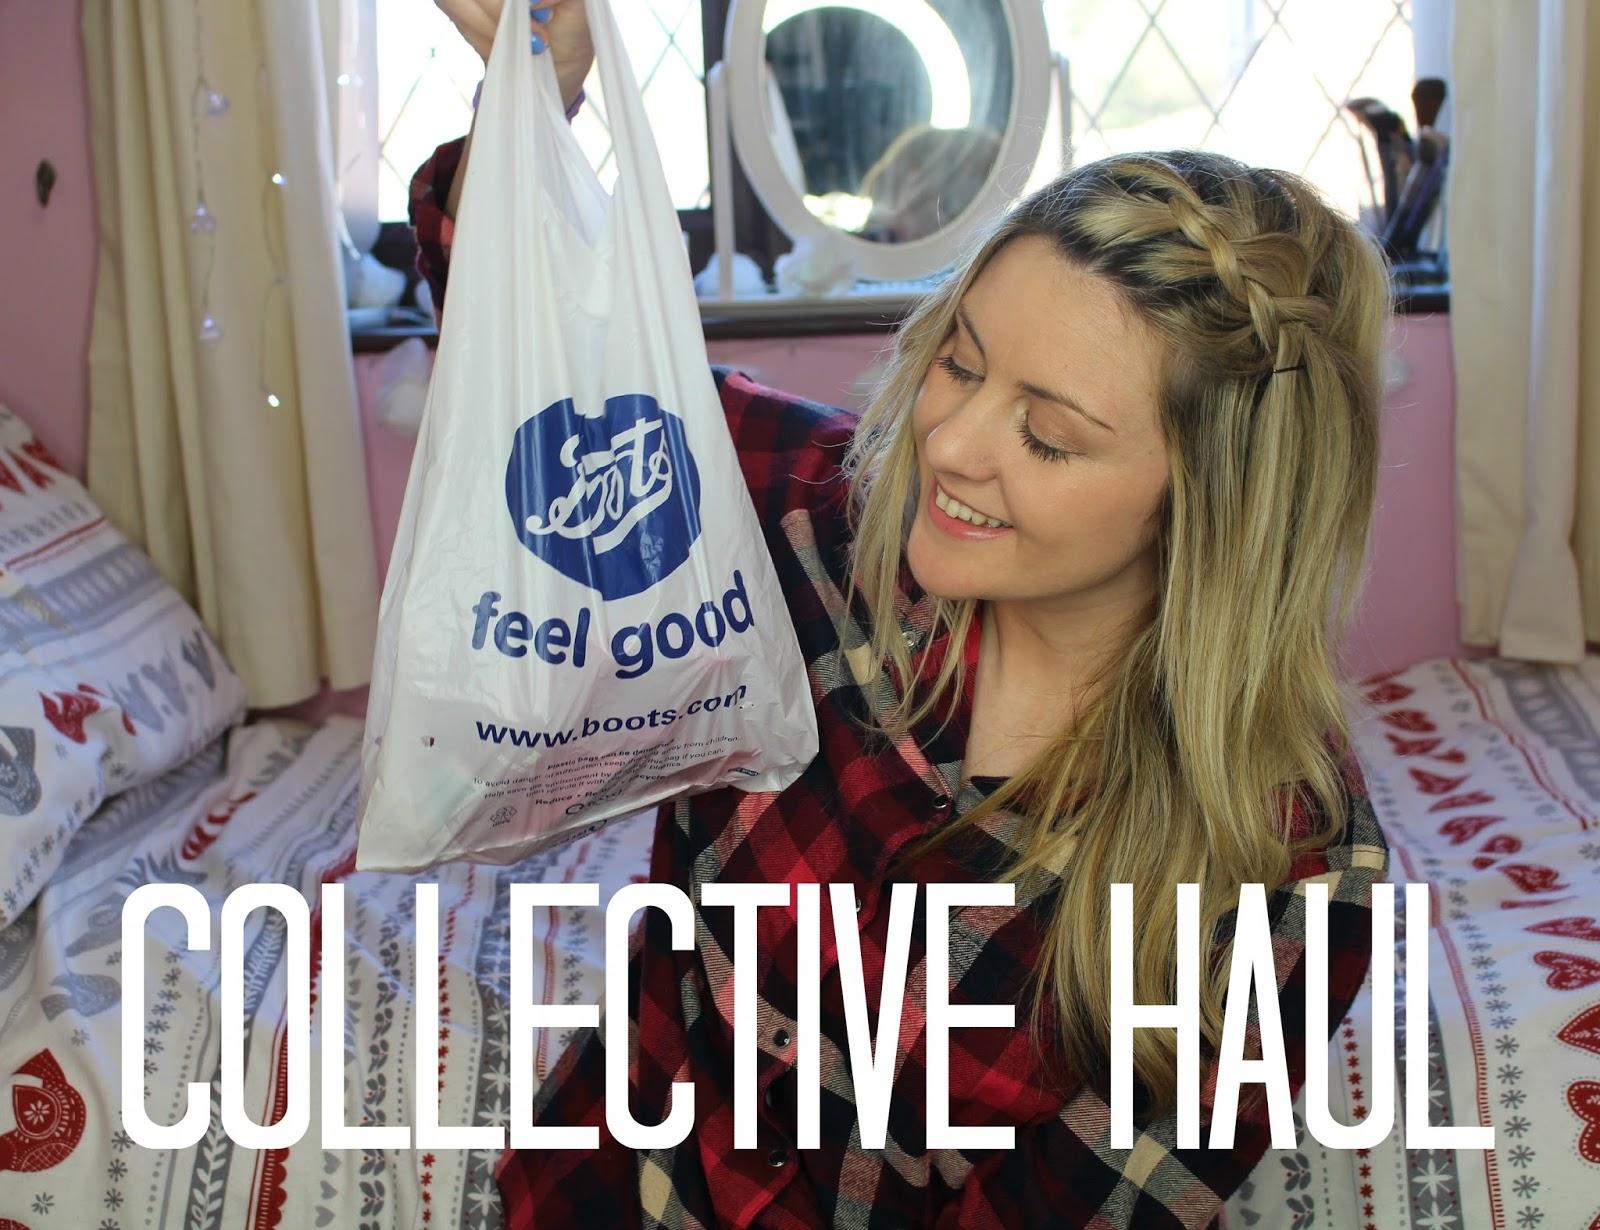 collective haul, through chelsea's eyes, boots haul, lush haul, clothing haul,